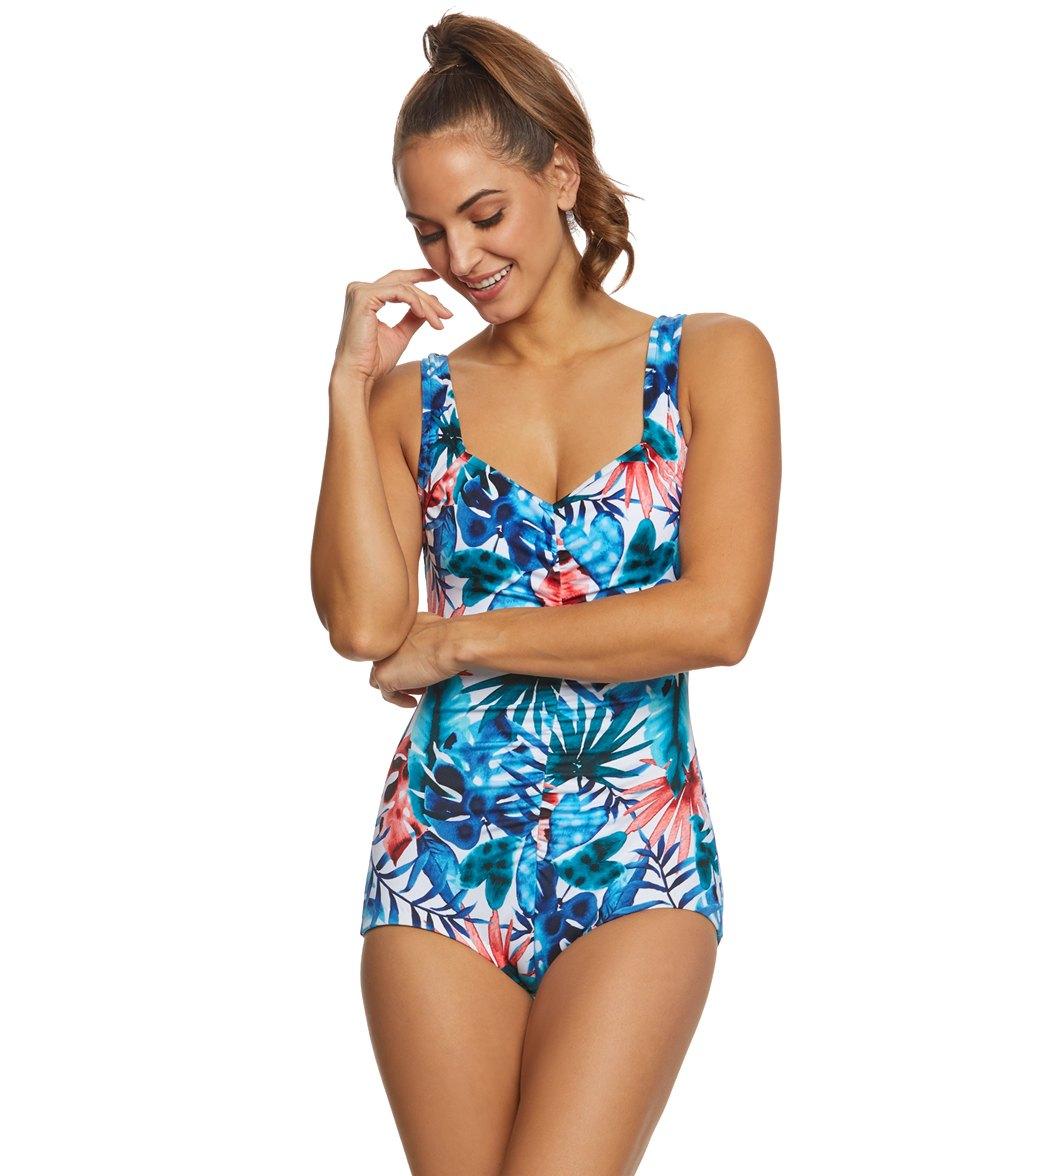 8f0b1f6aa4e ... Maxine Palmetto Spa Chlorine Resistant Girl Leg One Piece Swimsuit Play  Video. MODEL MEASUREMENTS